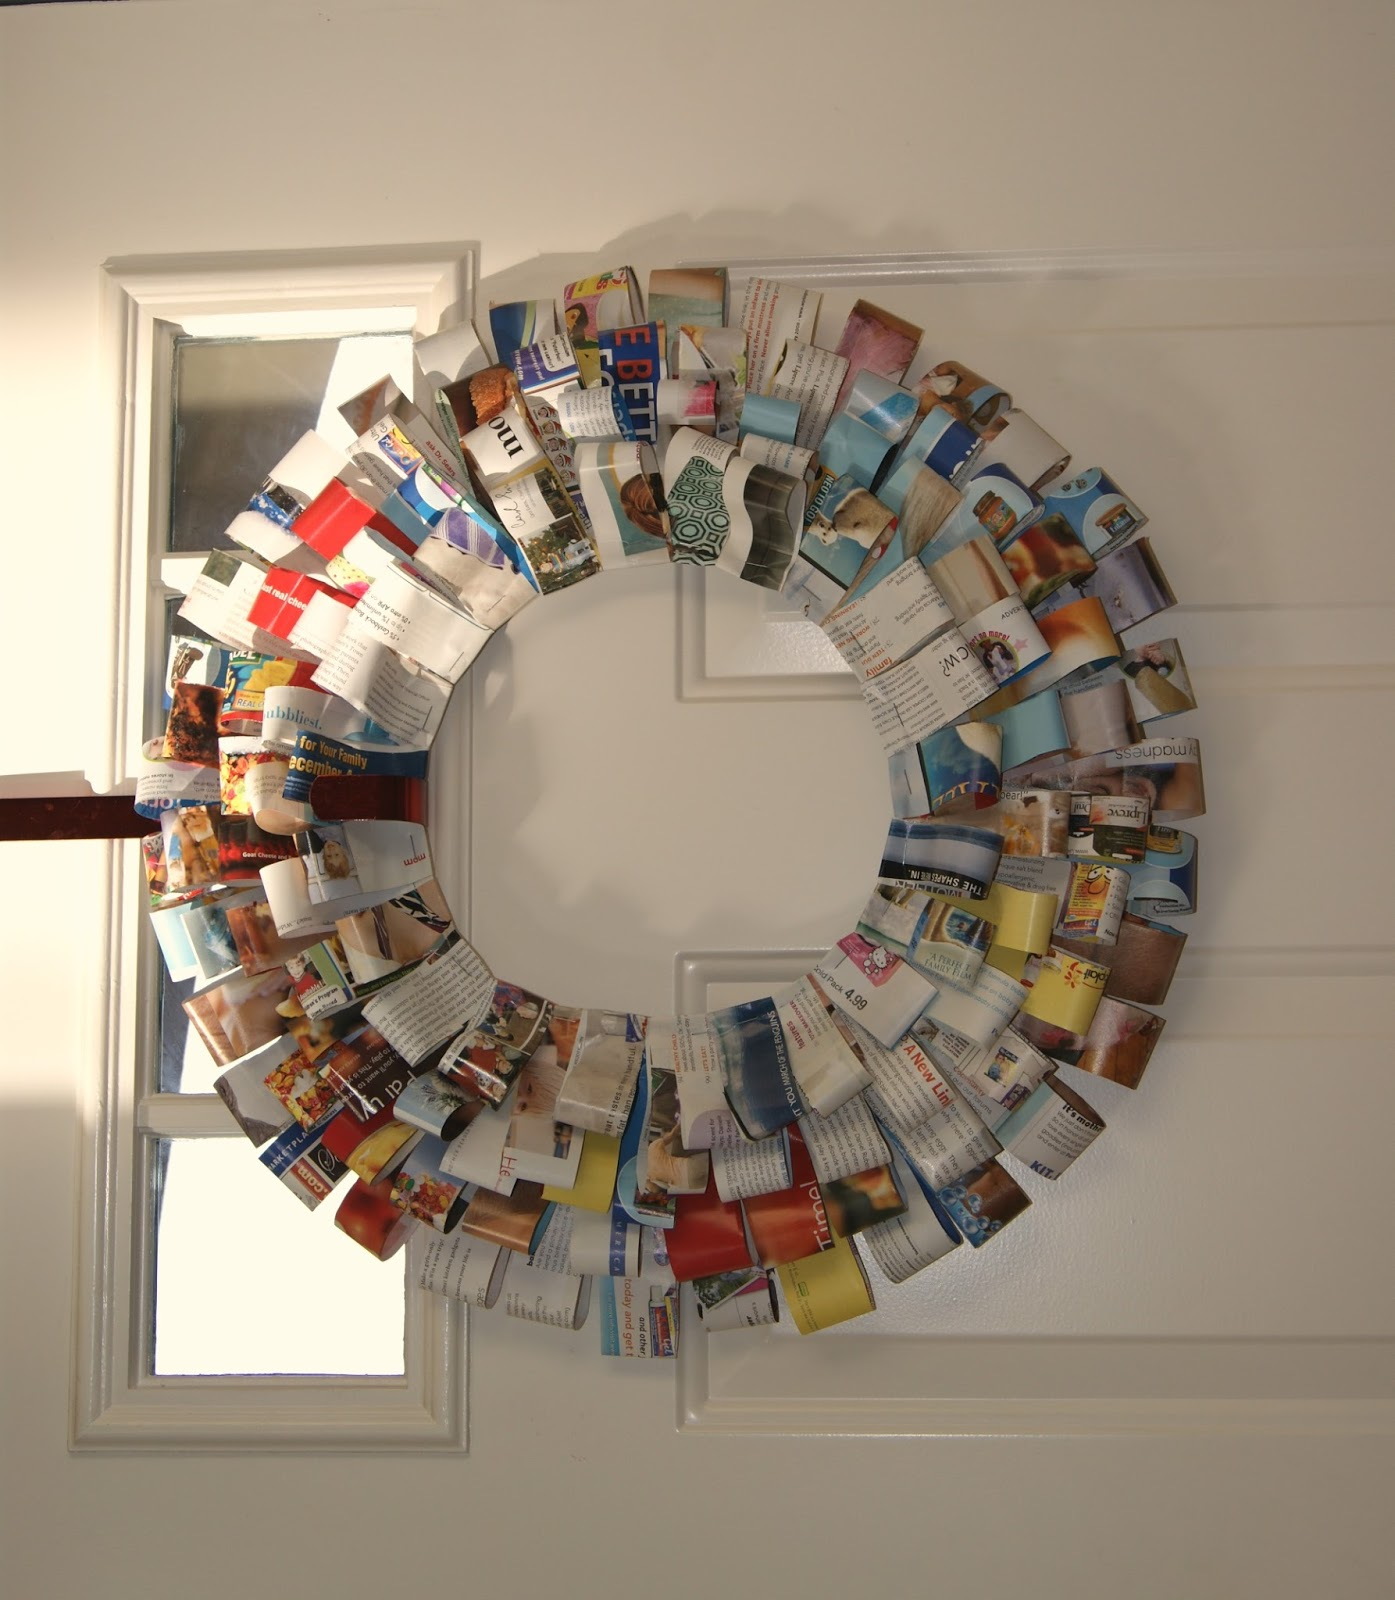 magazine wreath from Simple Joys